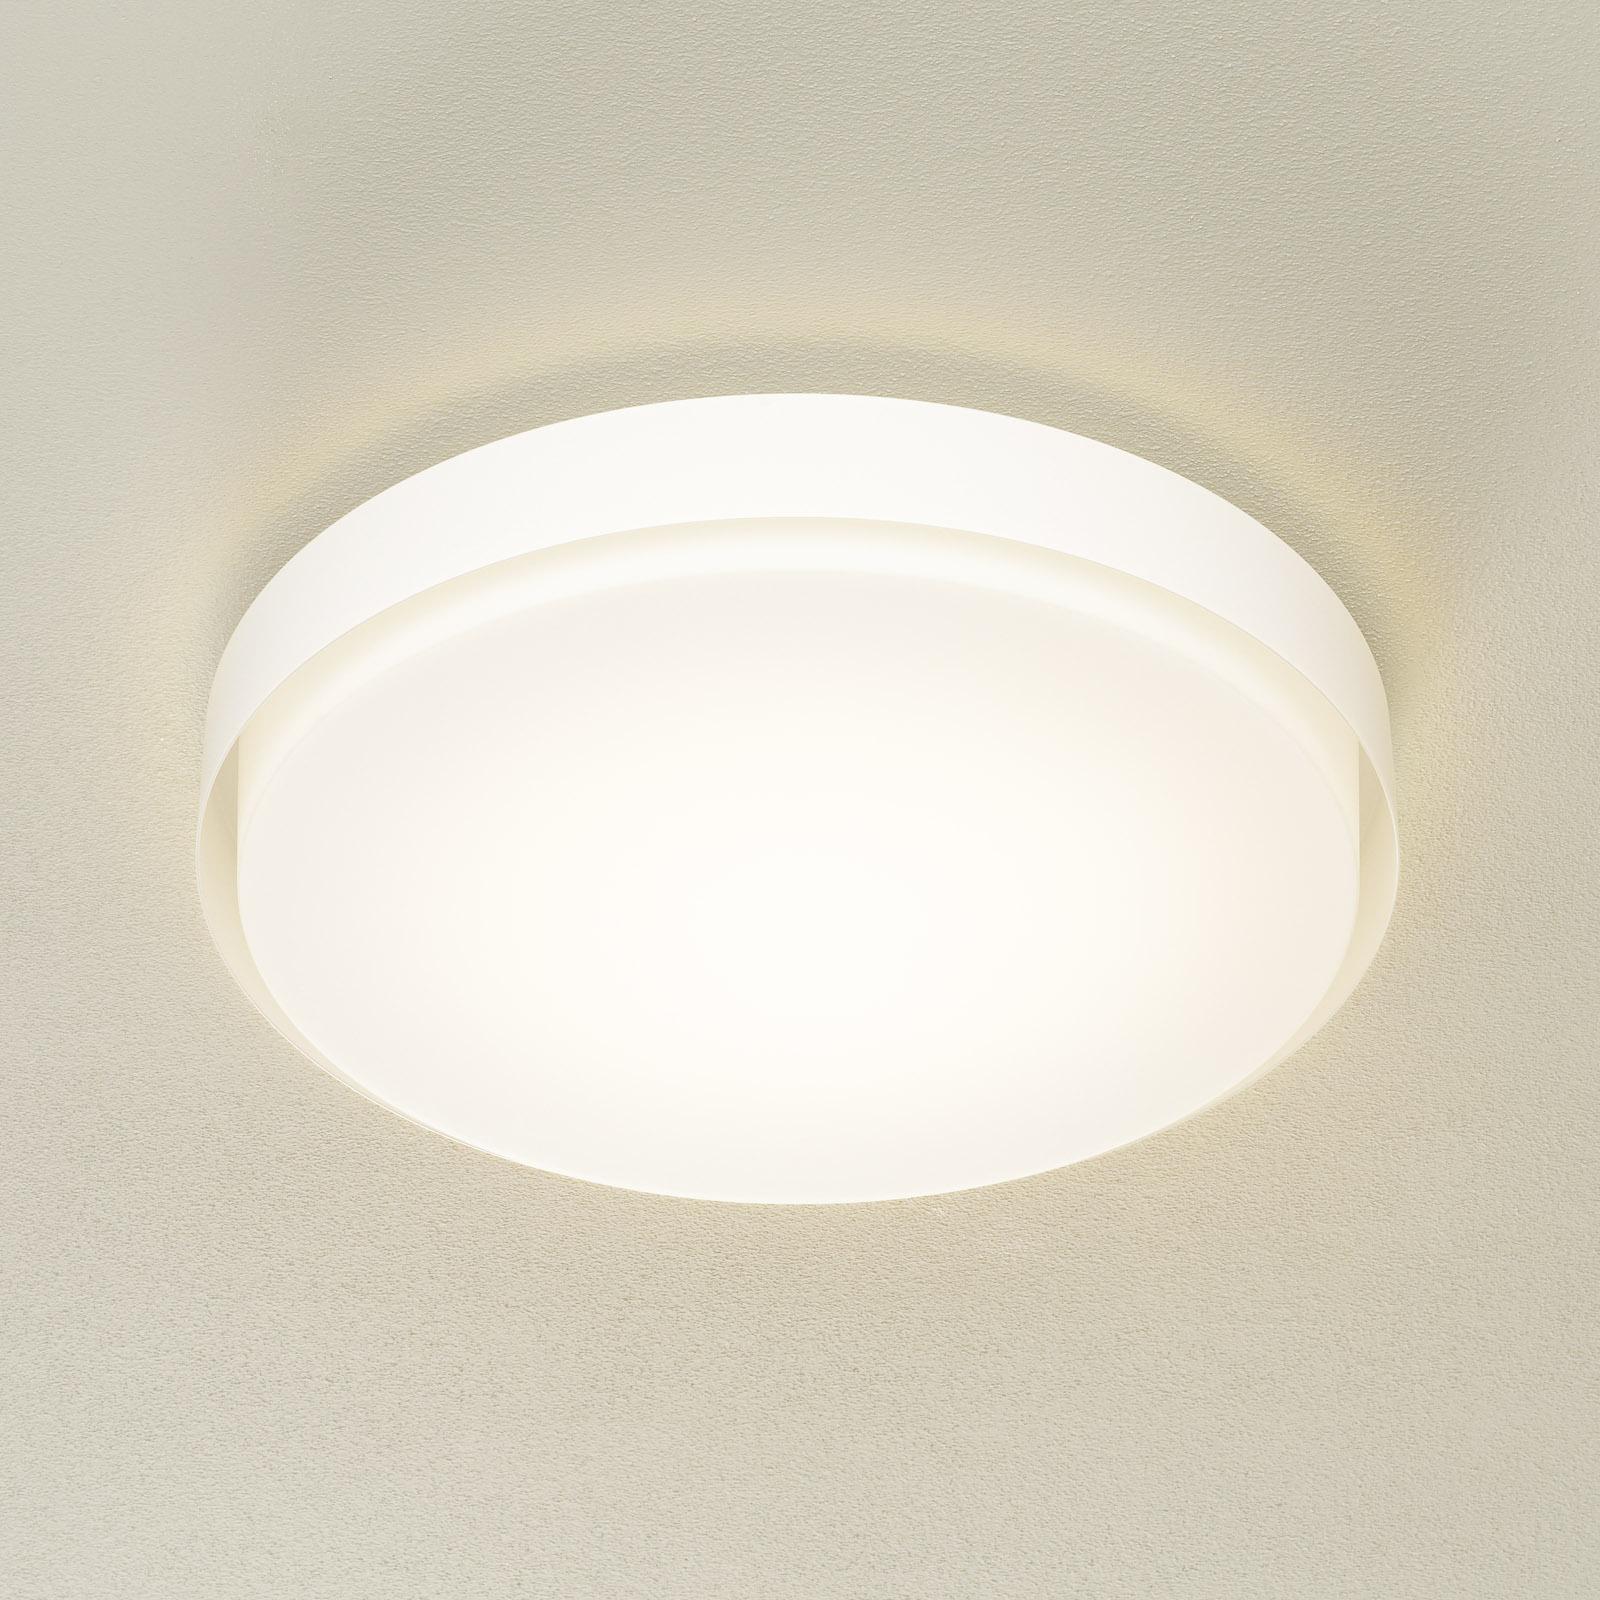 BEGA 12165 LED-kattovalaisin valk., Ø 50 cm, DALI